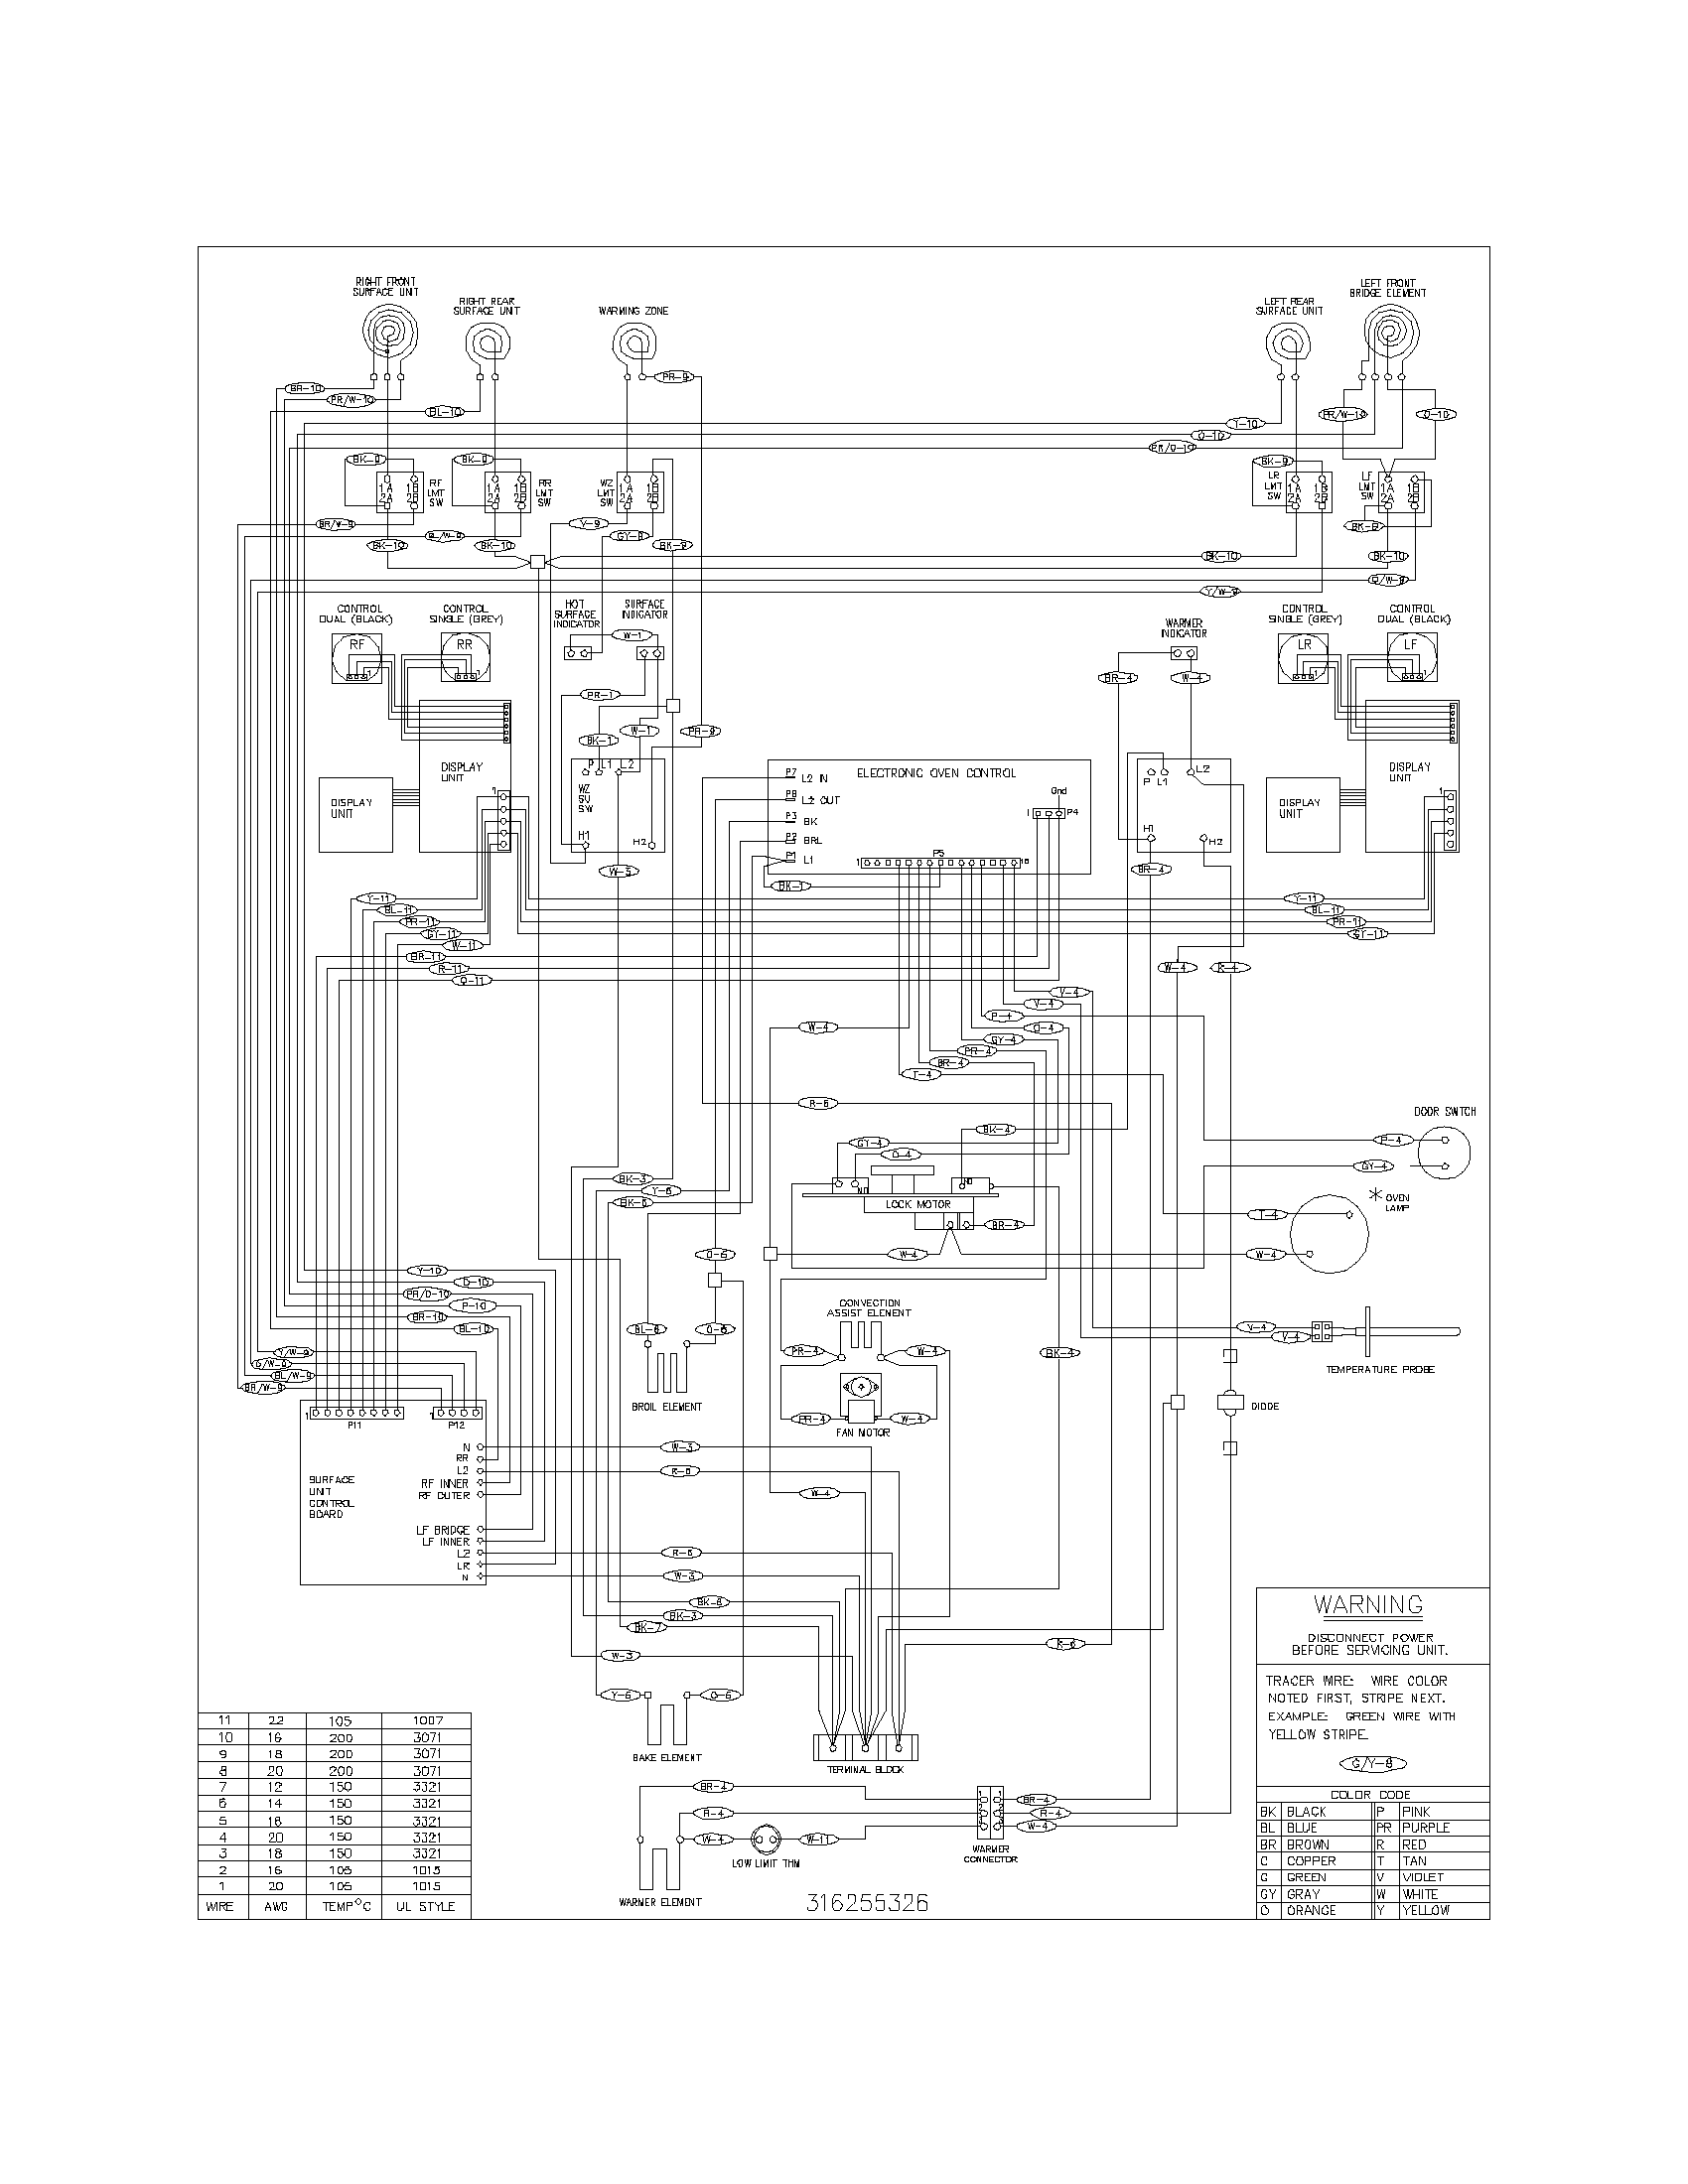 frigidaire wiring diagram 1995 johnson 115 plef398ccd electric range timer stove clocks